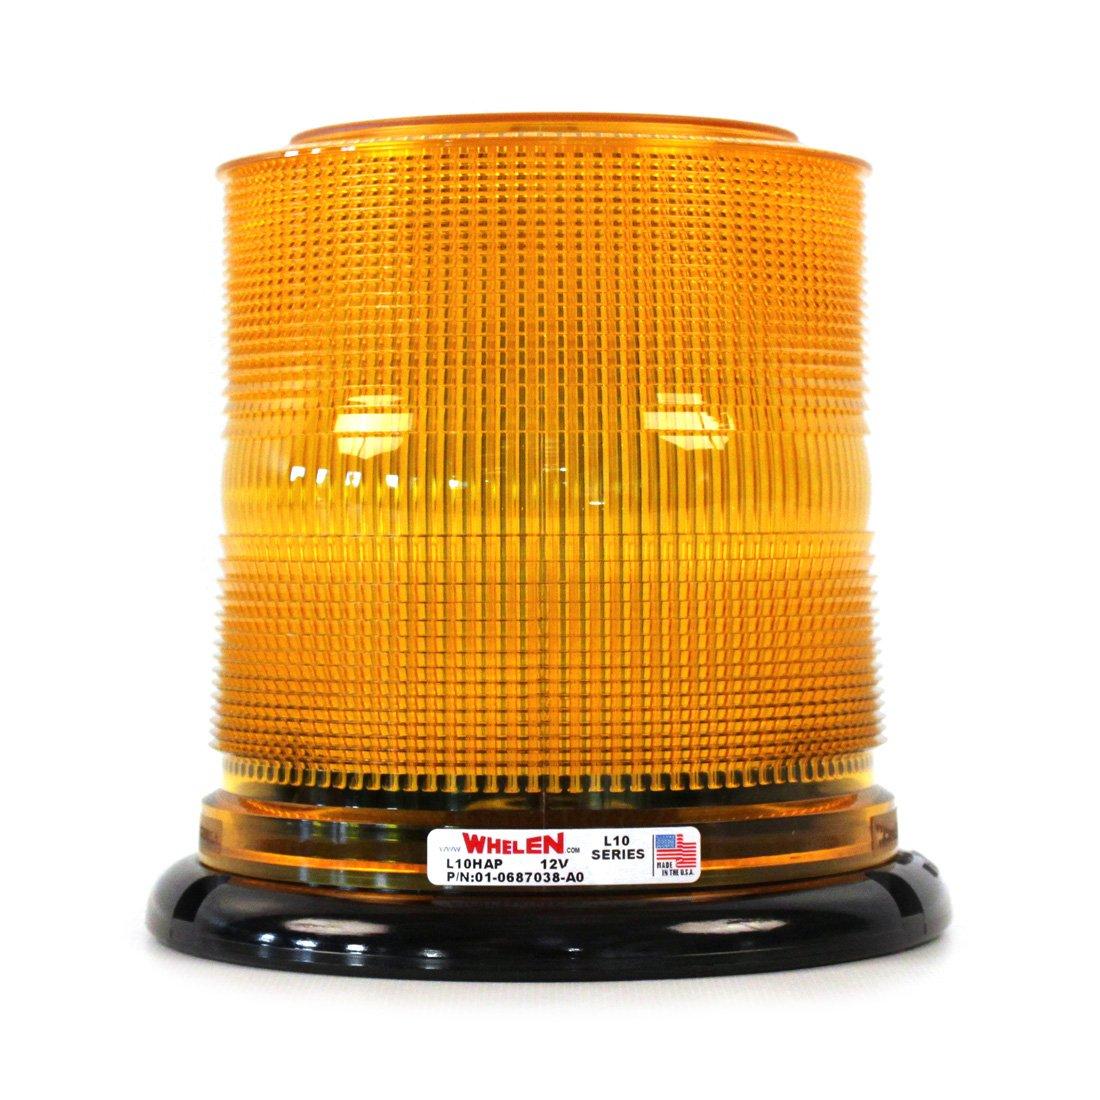 Amazon: Whelen L10 Series Economy Permanent Led Beacons  Amber:  Automotive